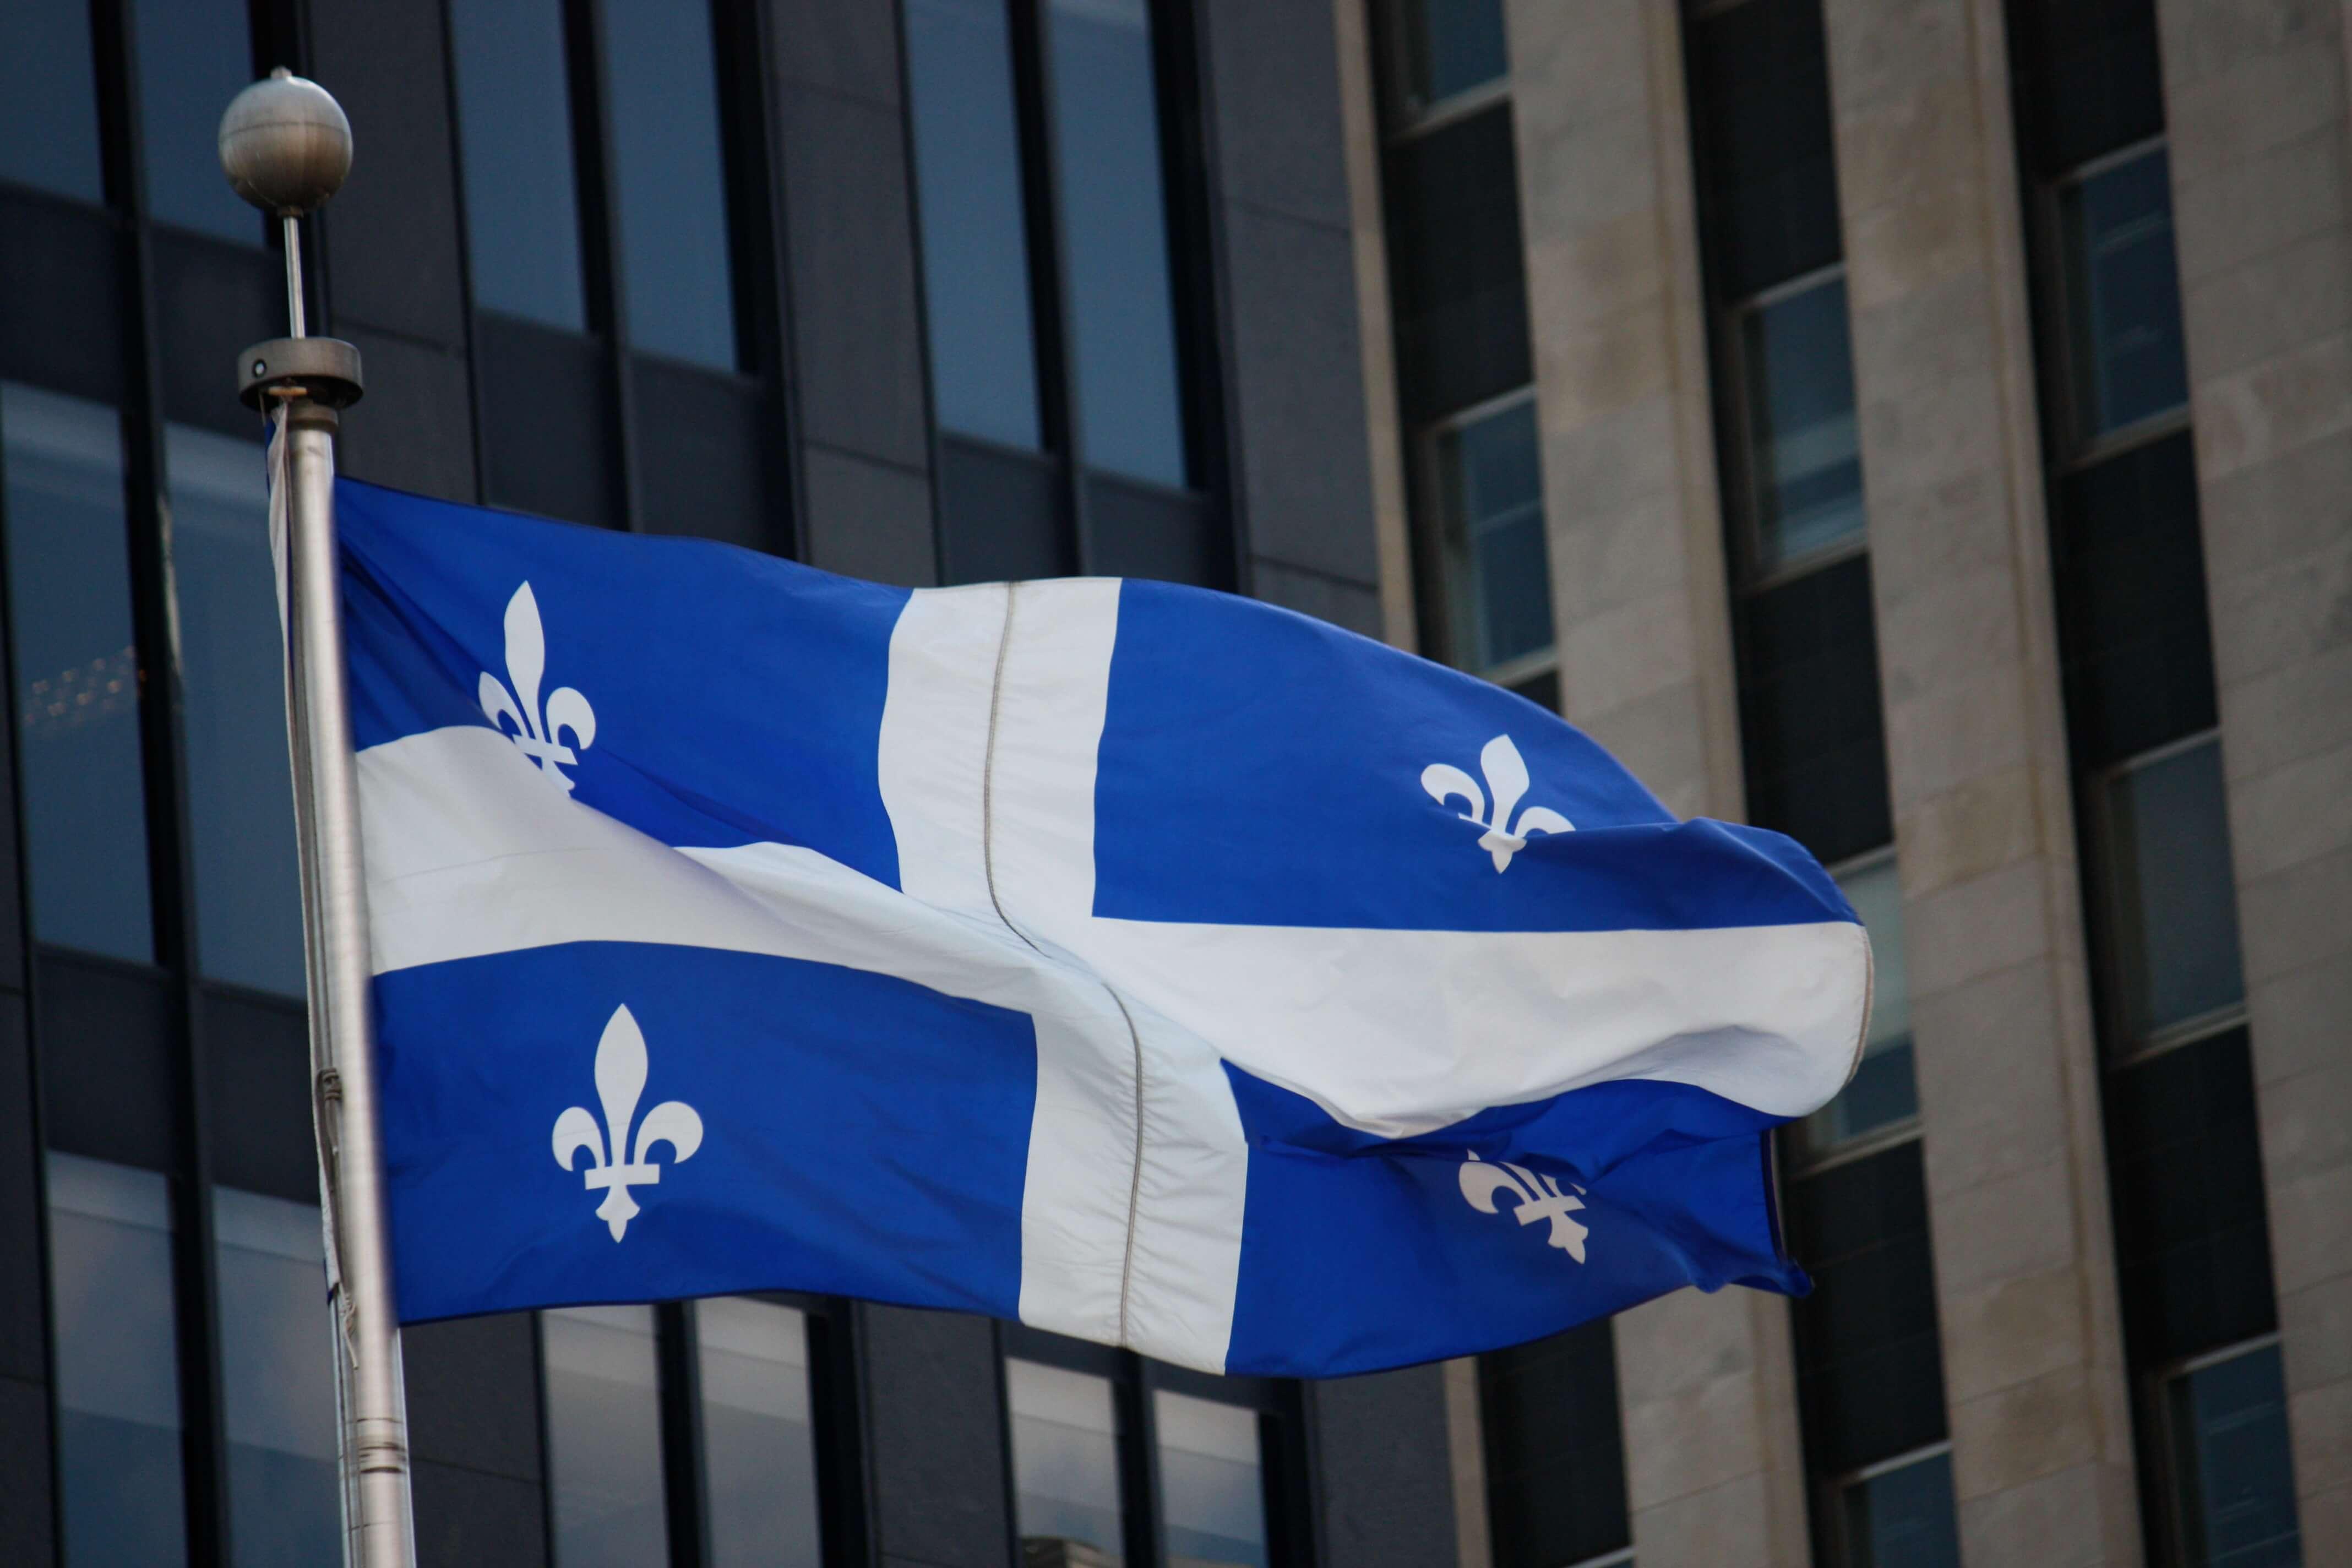 The Québec Charter of Values Project: Republican or Immigrant-phobic?